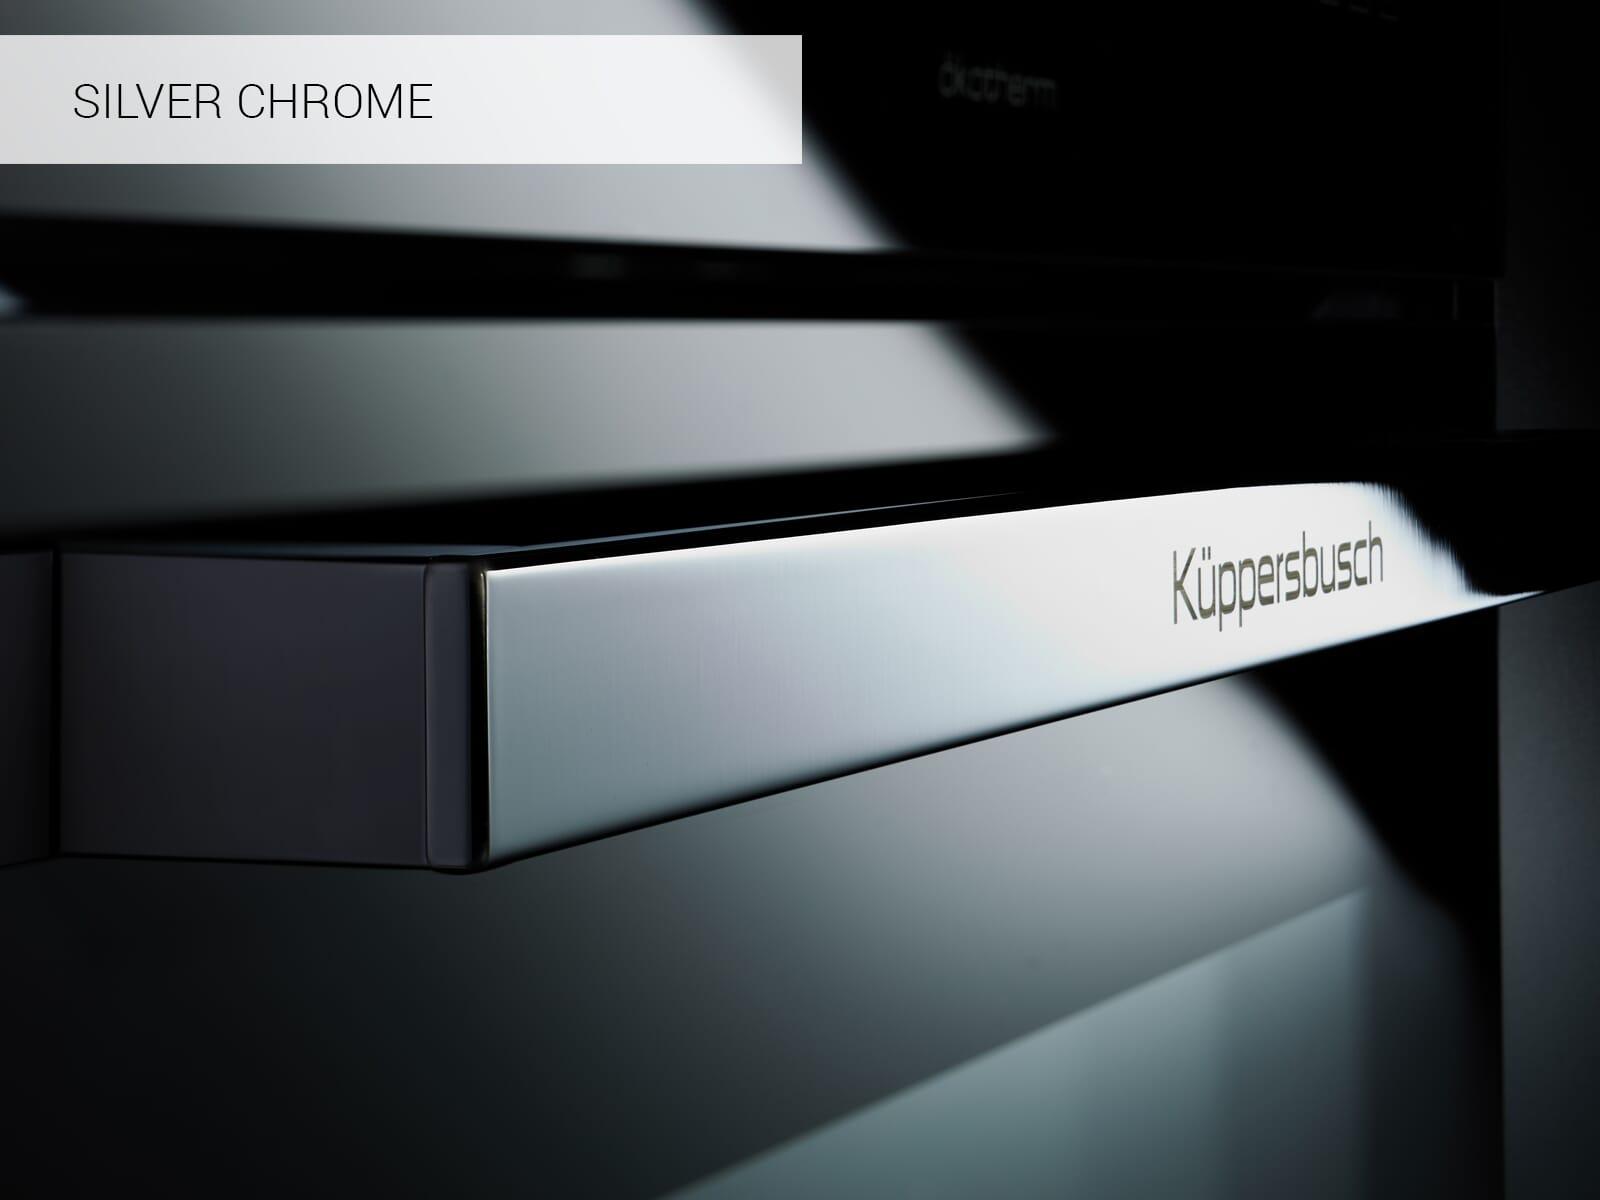 Küppersbusch B 6350.0 S3 Comfort+ Backofen Schwarz/Silver Chrome